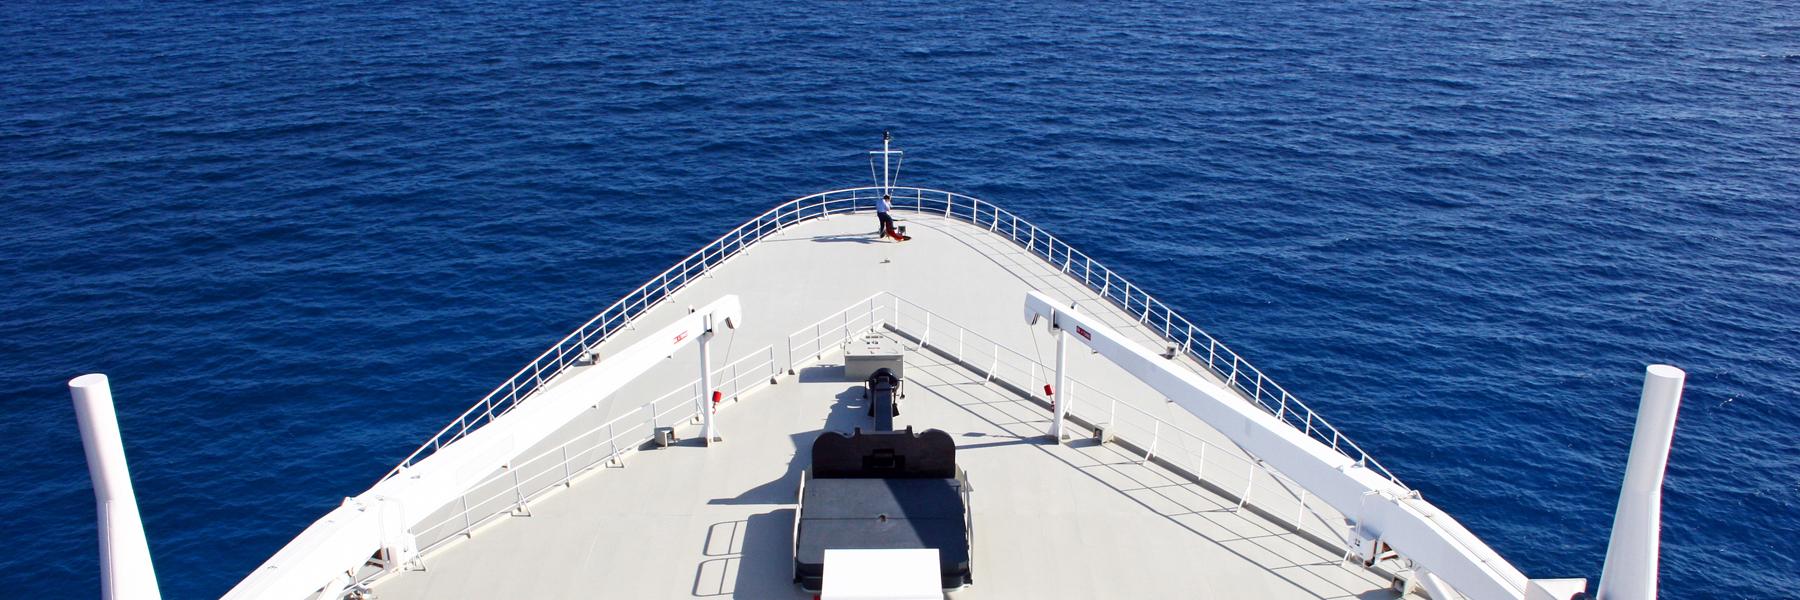 AIS Vessel Tracking